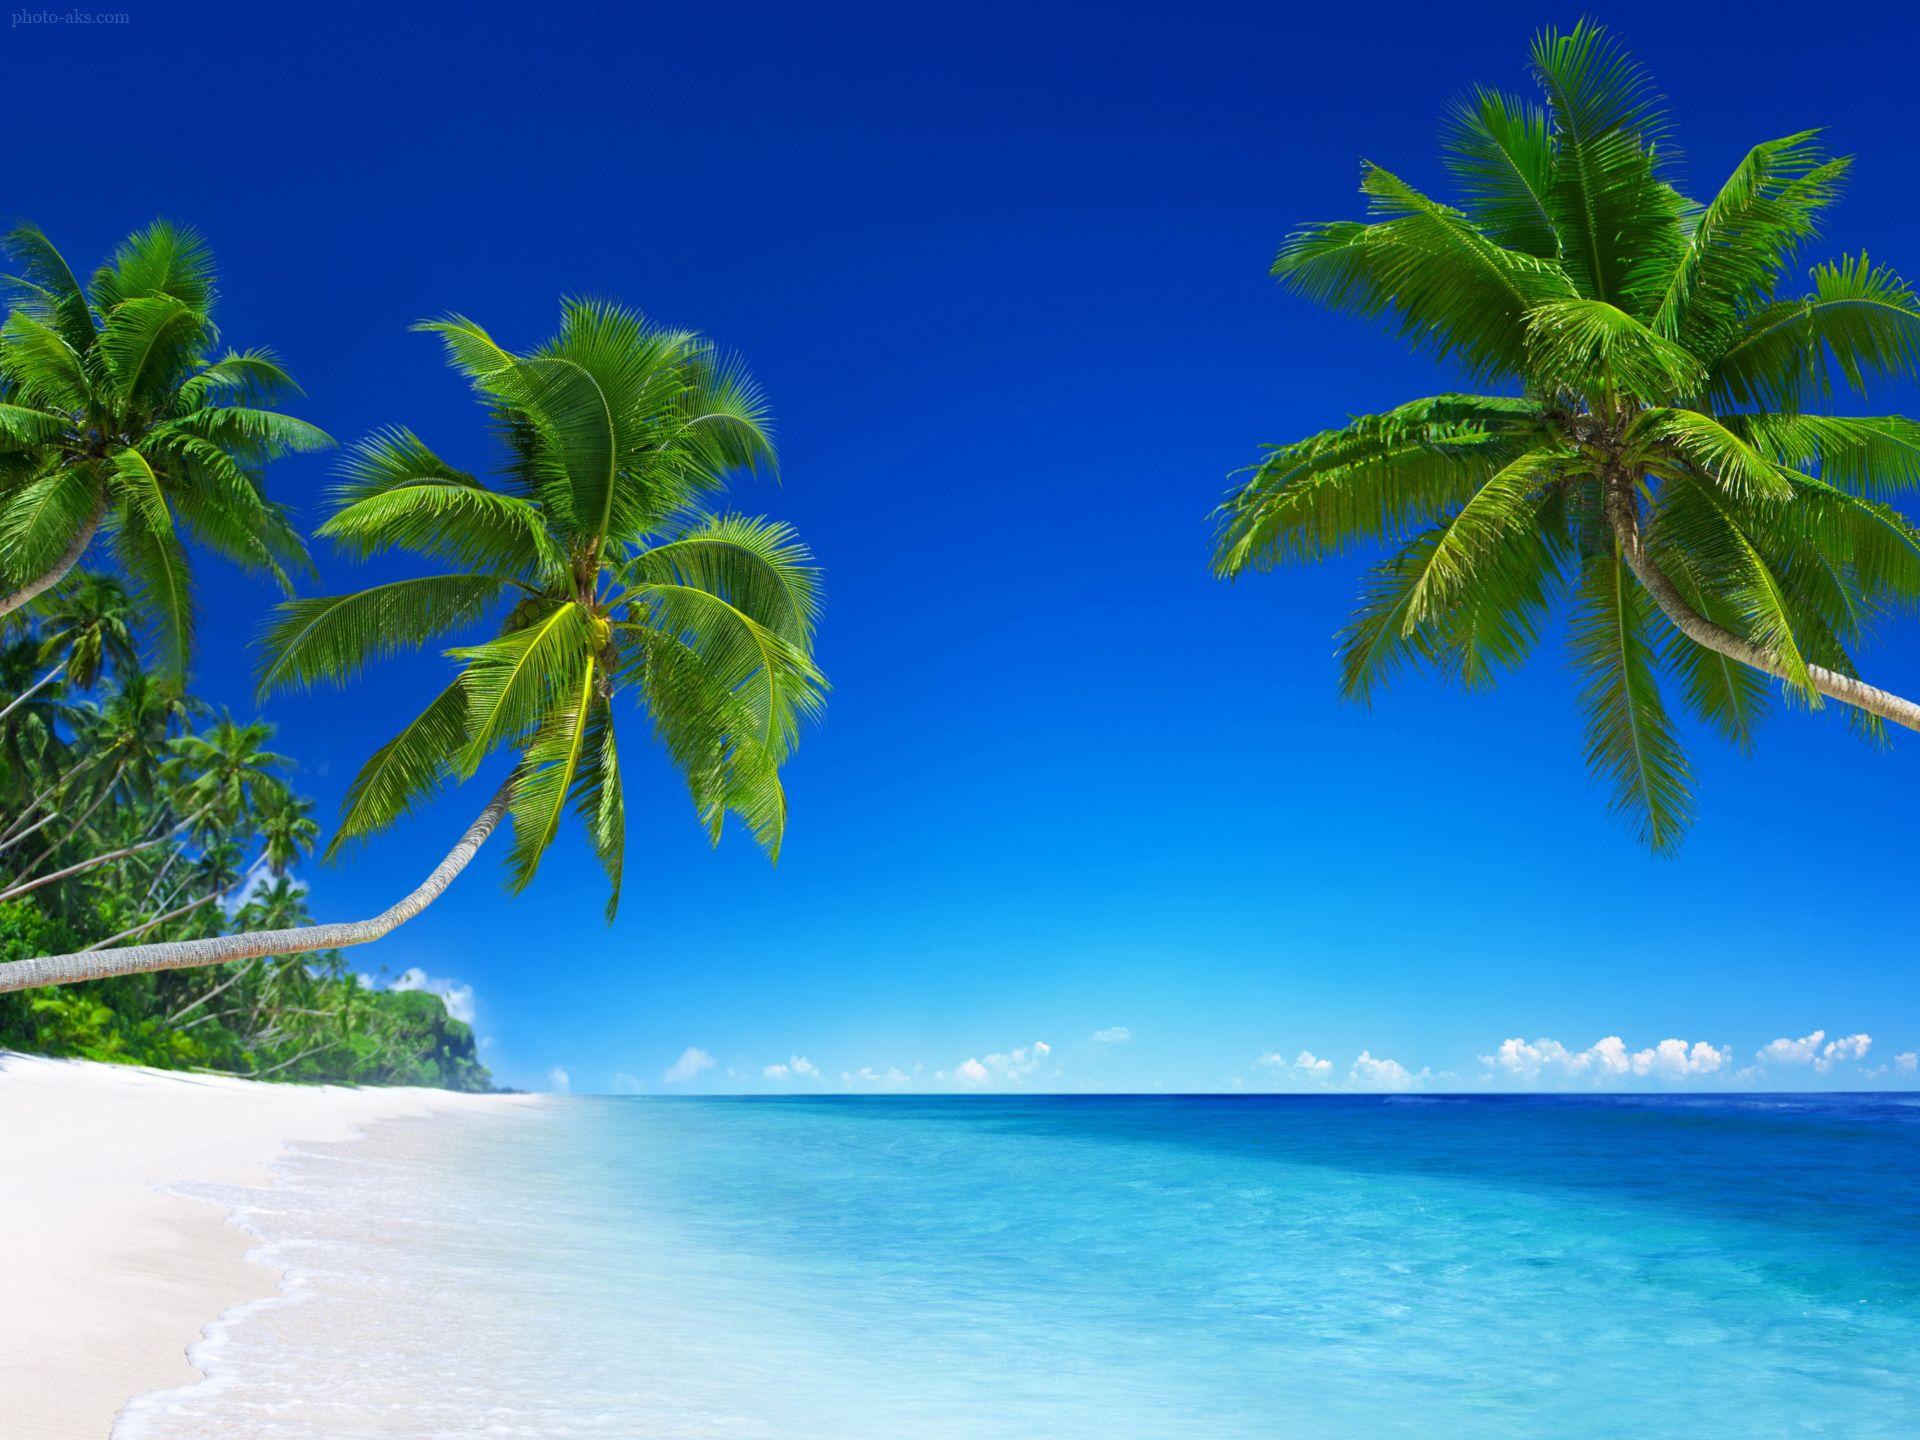 منظره زیبا سواحل آرام استوایی Beach wallpaper, Tropical